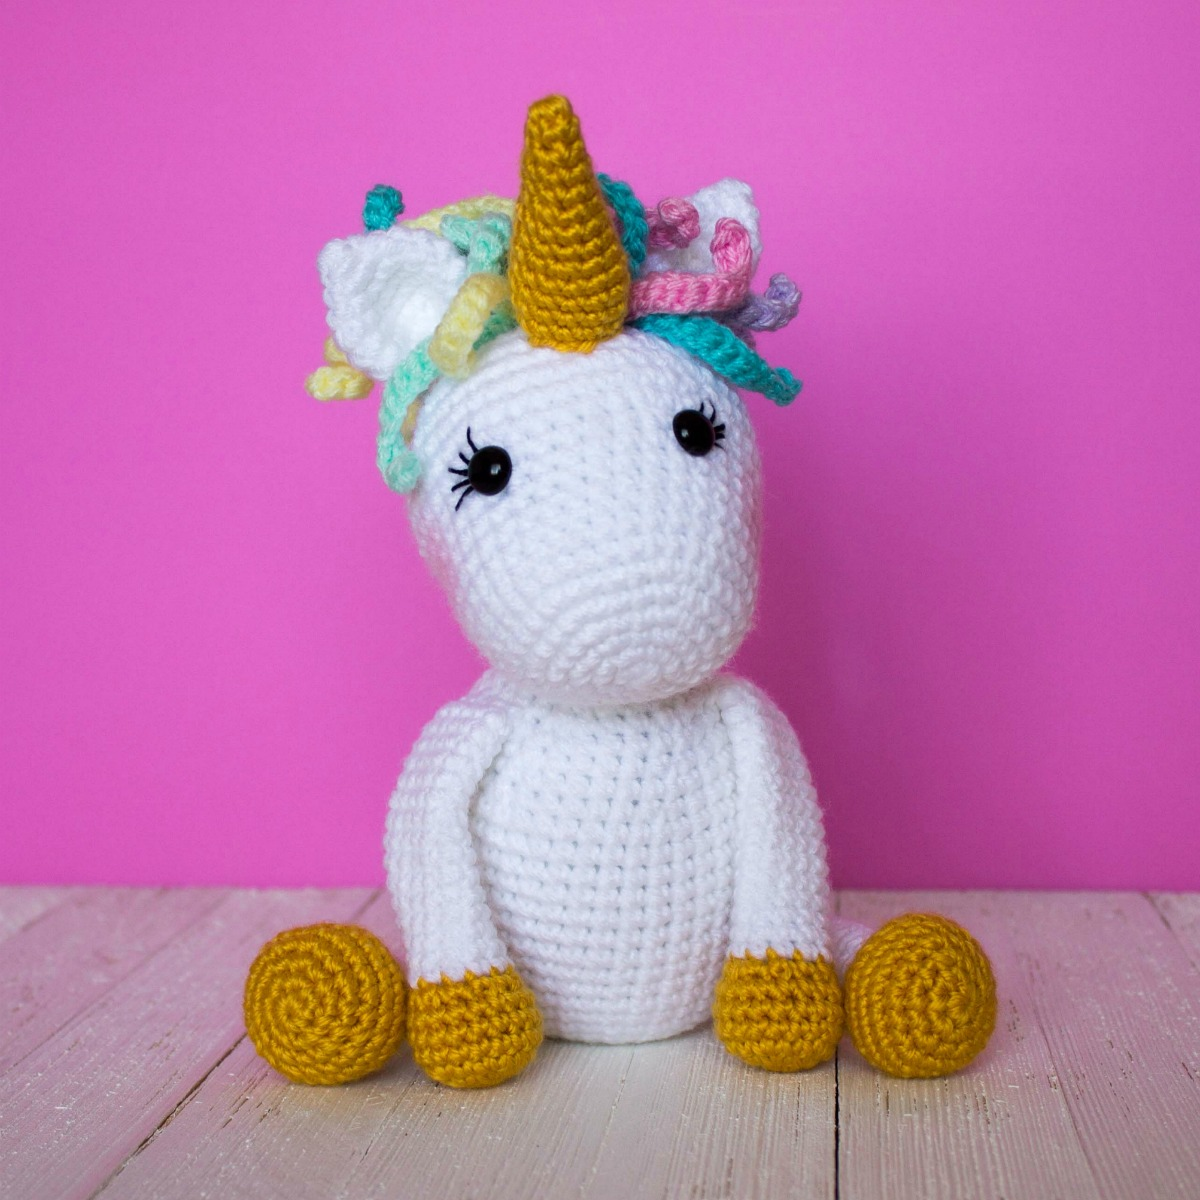 Crochet Unicorn Pattern Free Best Decorating Ideas